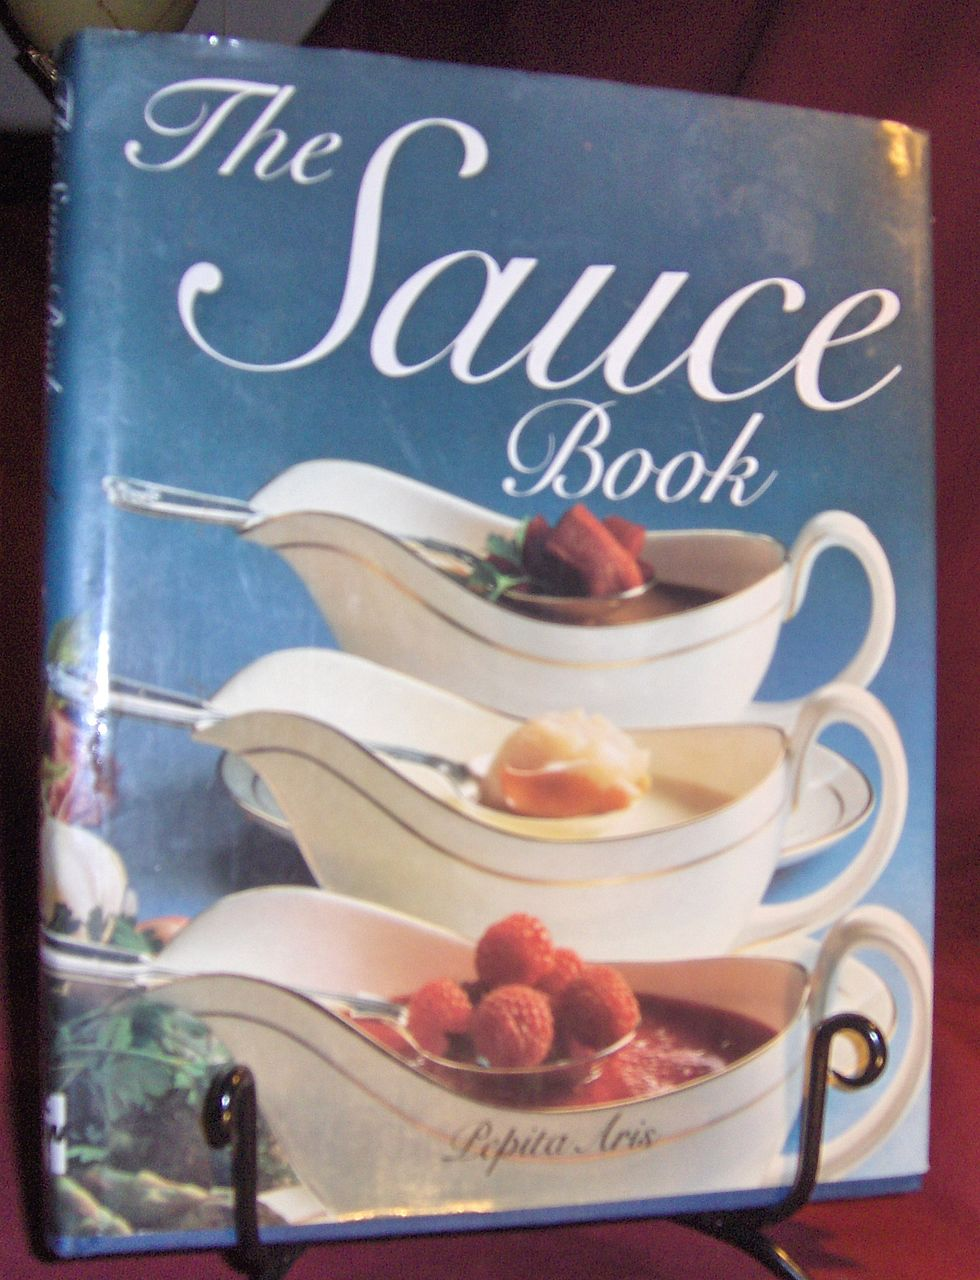 Book – The Sauce Book by Pepita Aris